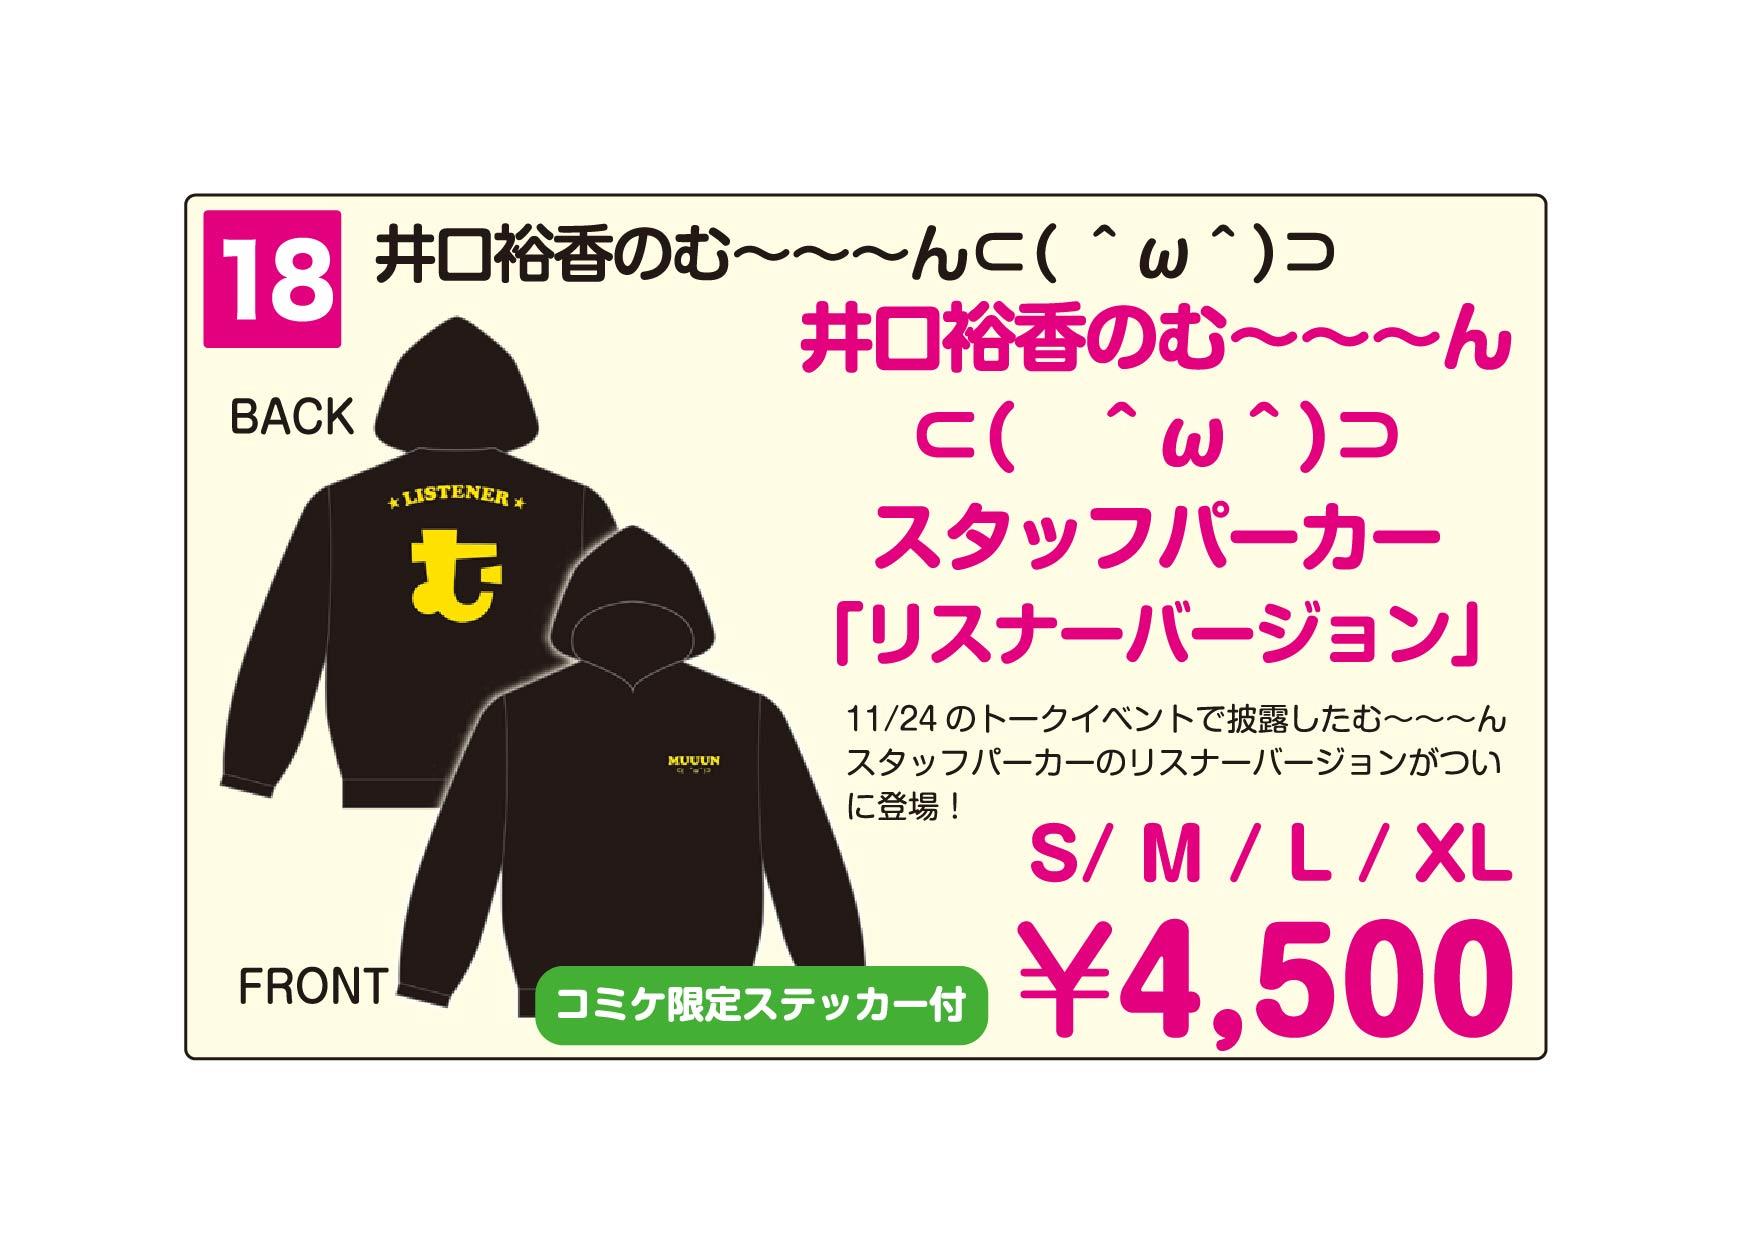 http://www.joqr.co.jp/AandG_booth/18.jpg